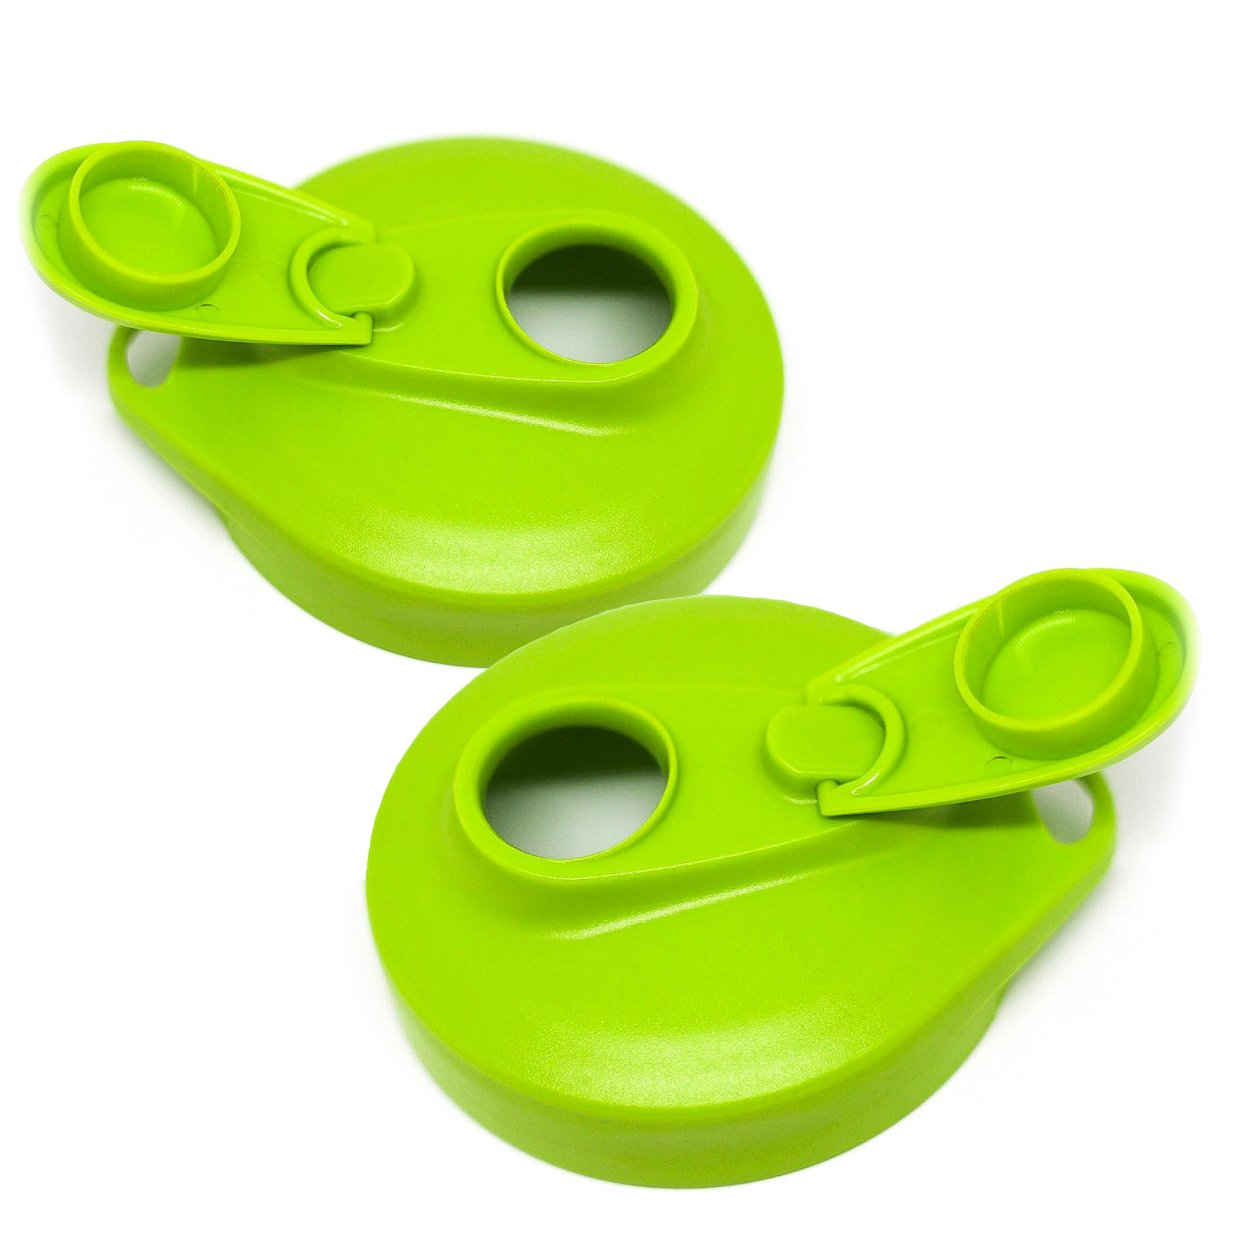 Masontops Multi Top Plastic Mason Jar Lids with Pour Spout and Flip Cap – Sip, Pour, Store & More – Fits Any Wide Mouth Mason Jar - 2 Pack Green